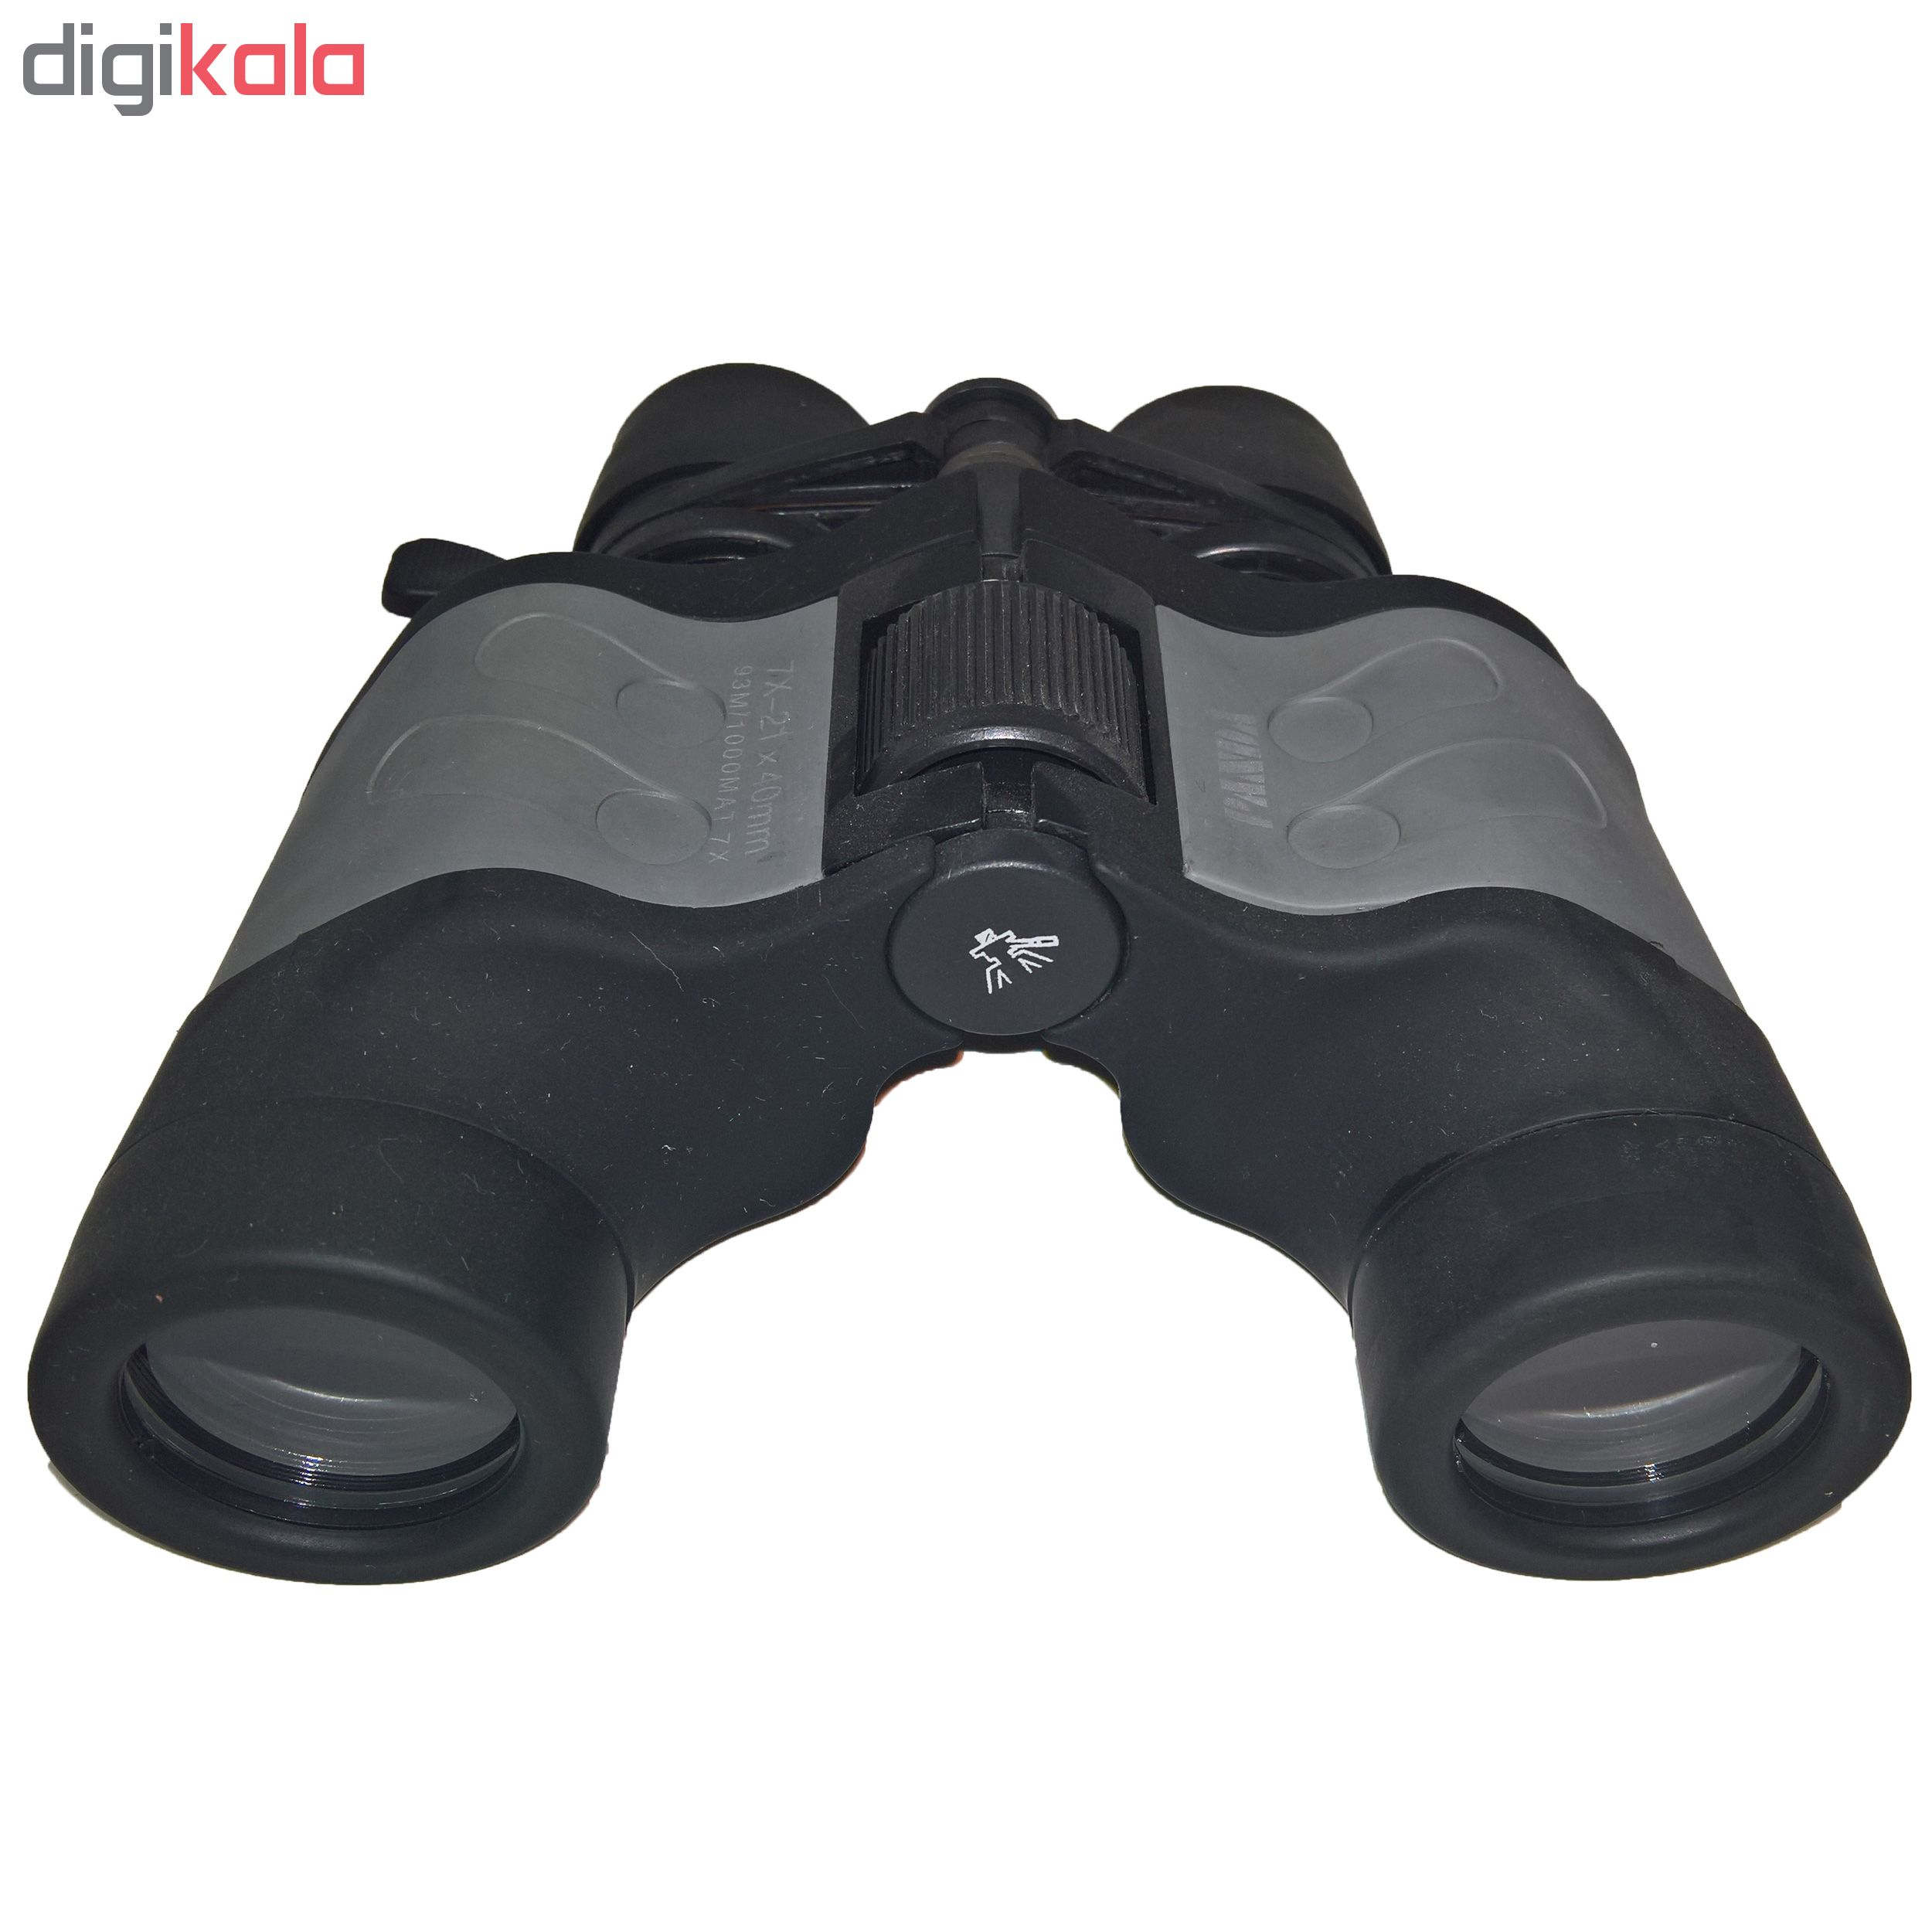 دوربین دو چشمی پاندا مدل MAT-7   7-21×40